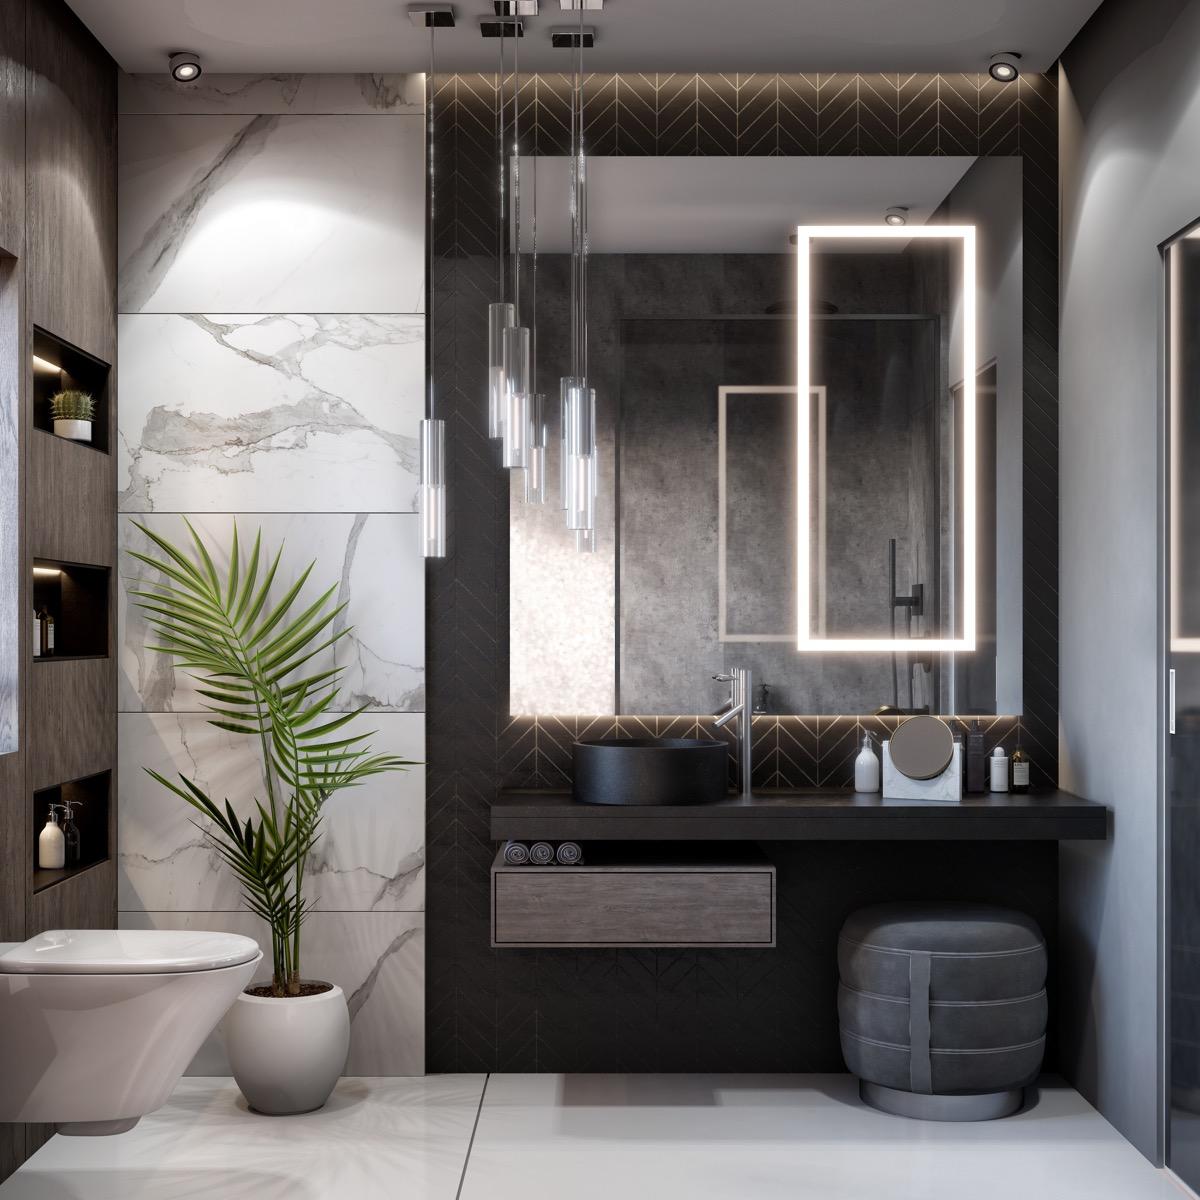 master-bathroom-vanity-with-makeup-area